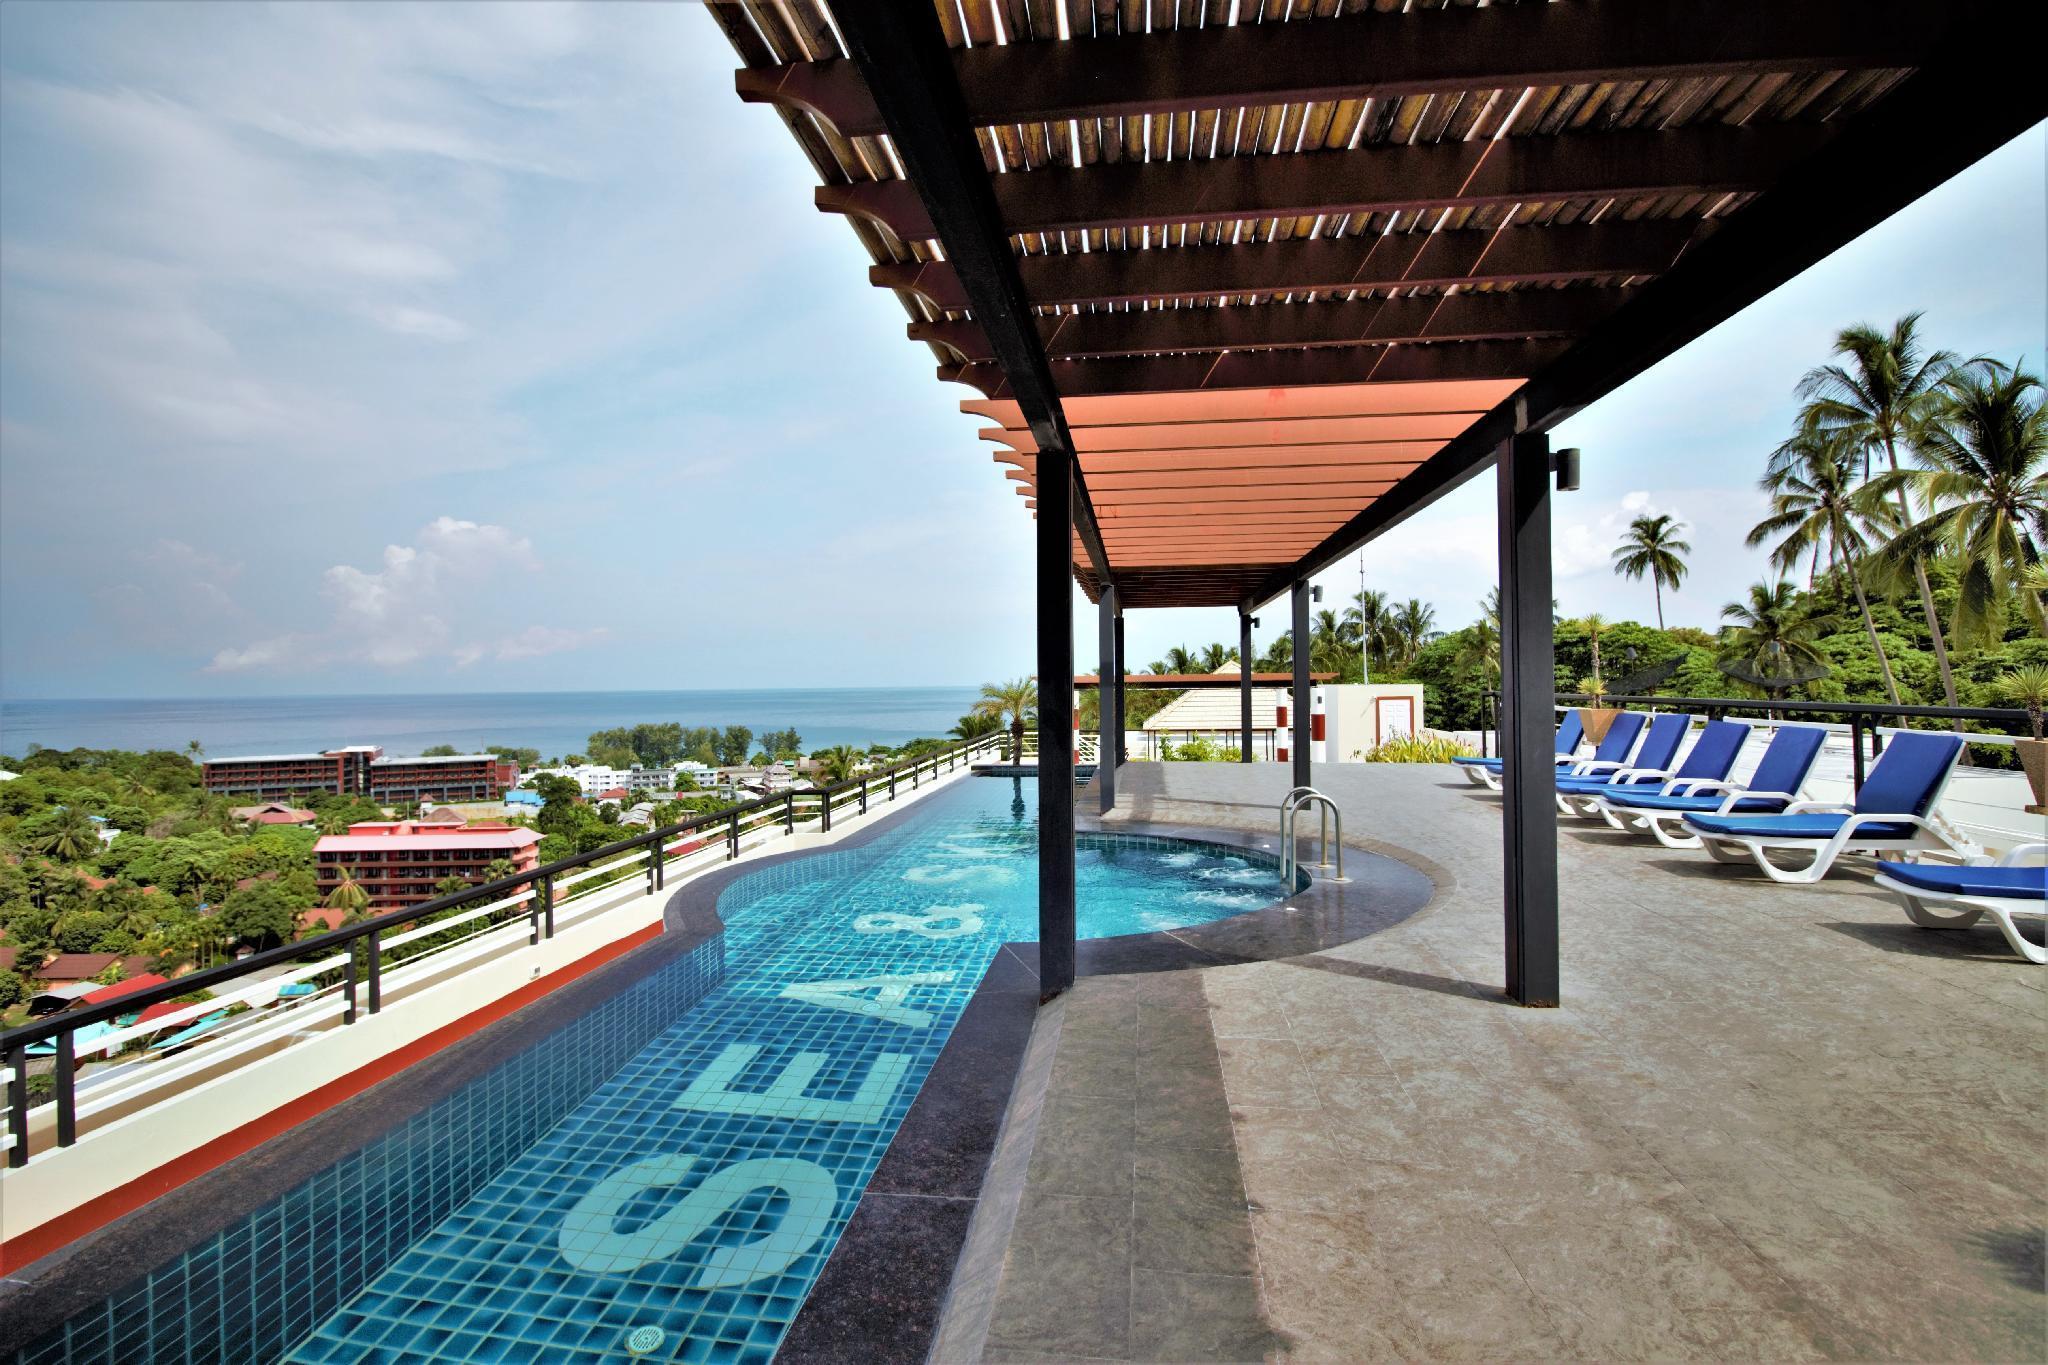 Sea & Sky Karon Beach 5 by PHR อพาร์ตเมนต์ 1 ห้องนอน 1 ห้องน้ำส่วนตัว ขนาด 50 ตร.ม. – กะรน